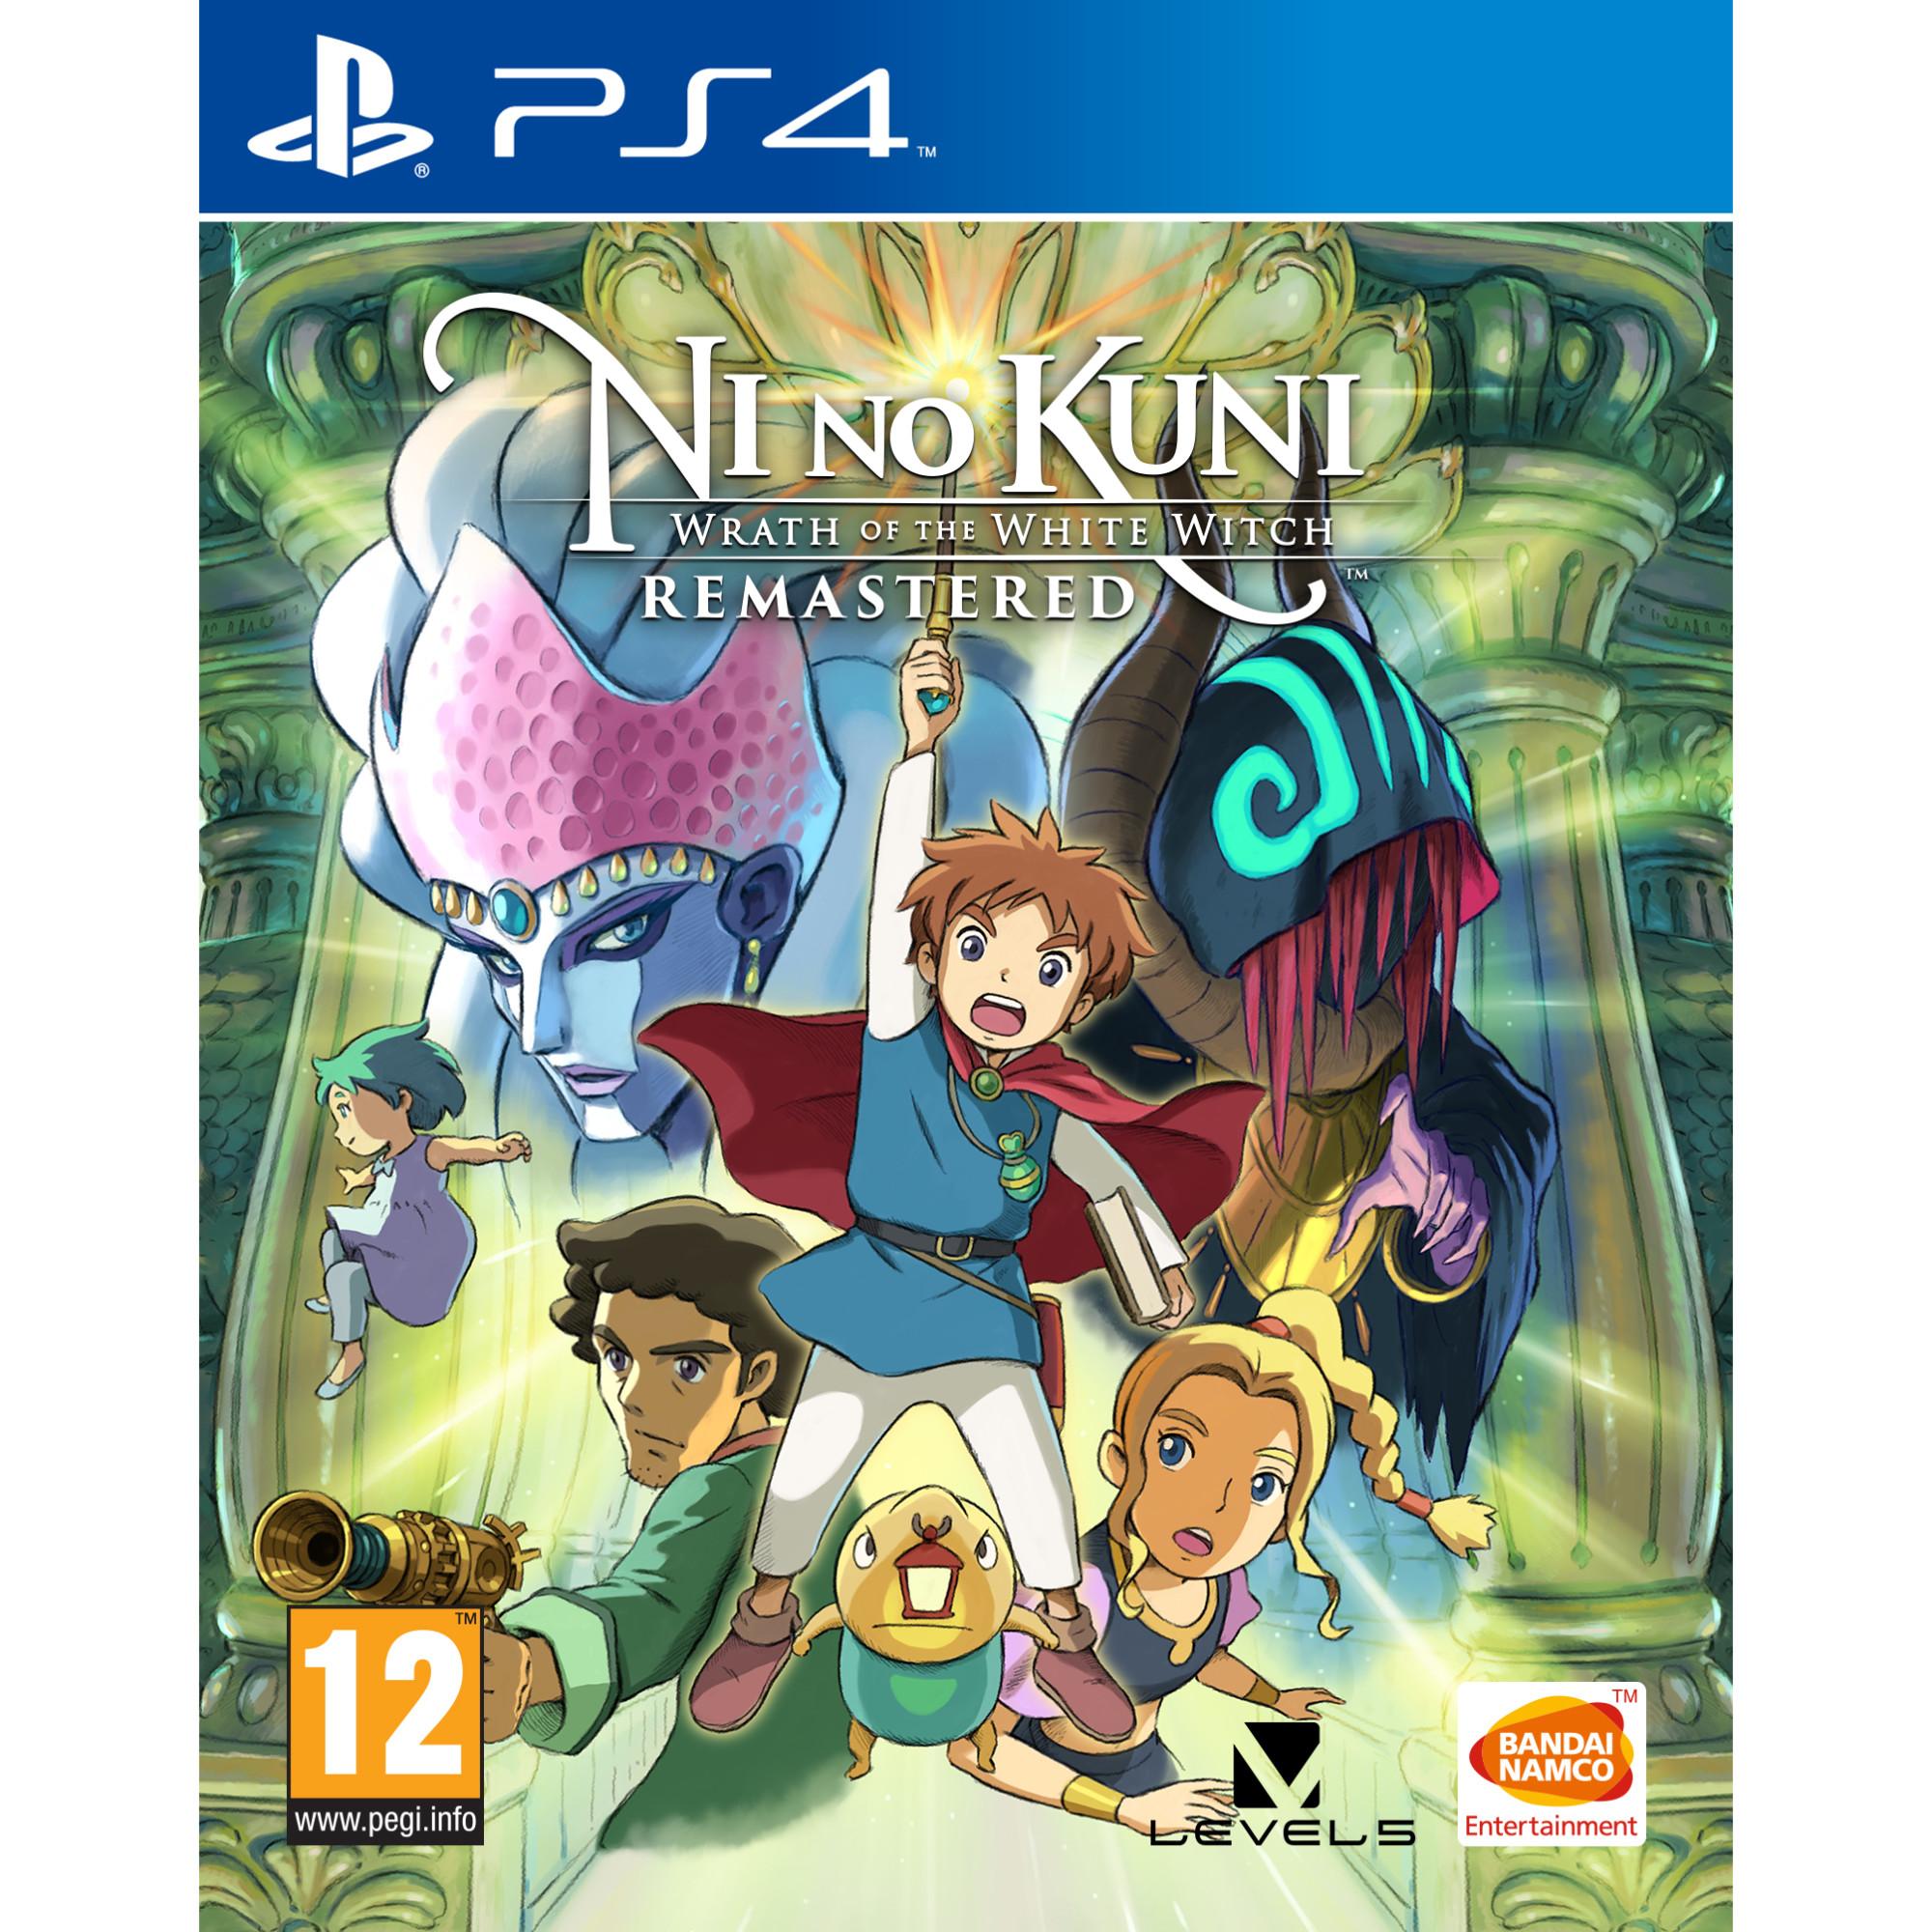 Joc NI NO KUNI: WRATH OF THE WHITE WITCH REMASTERED pentru PlayStation 4 1